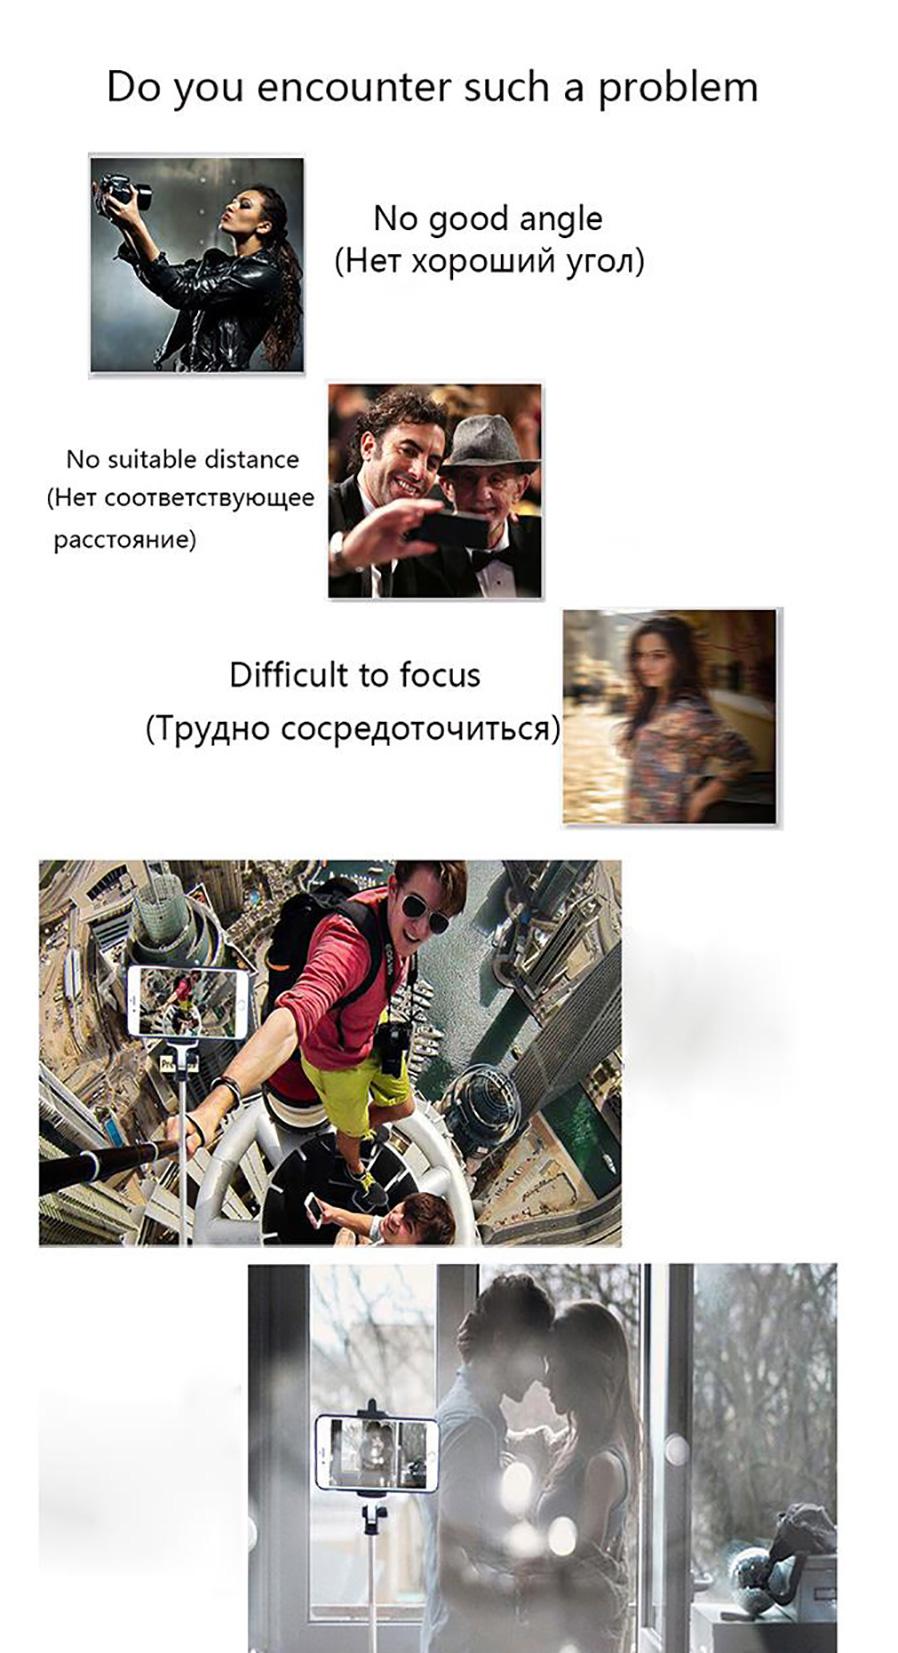 i.ibb.co/MGFqKZS/Bast-o-Trip-Dobr-vel-Selfie-para-Smartphone-NRZBN9-EY-3.jpg